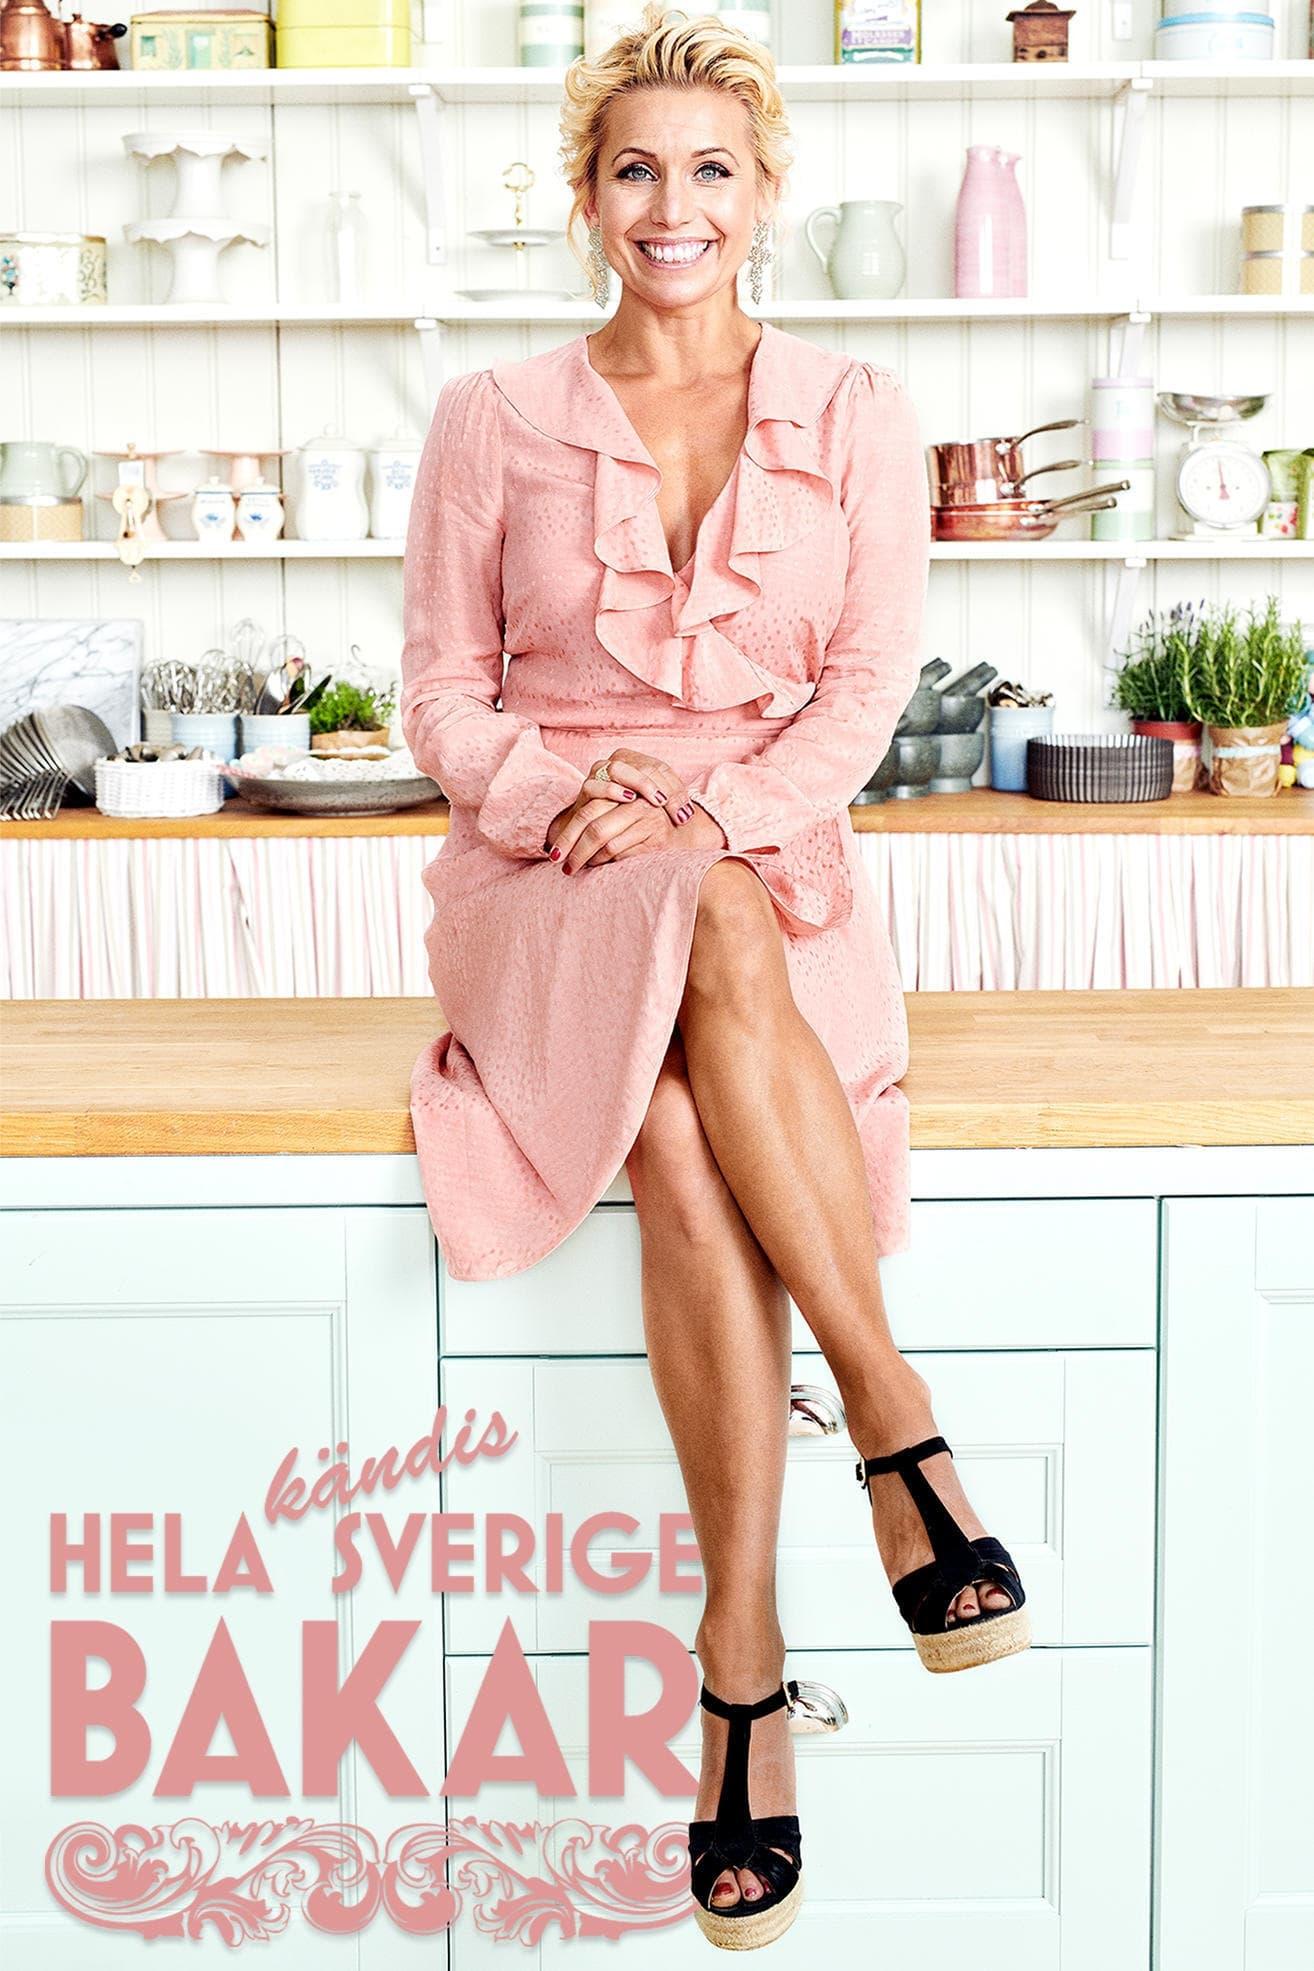 Hela Kändis-Sverige Bakar TV Shows About Baking